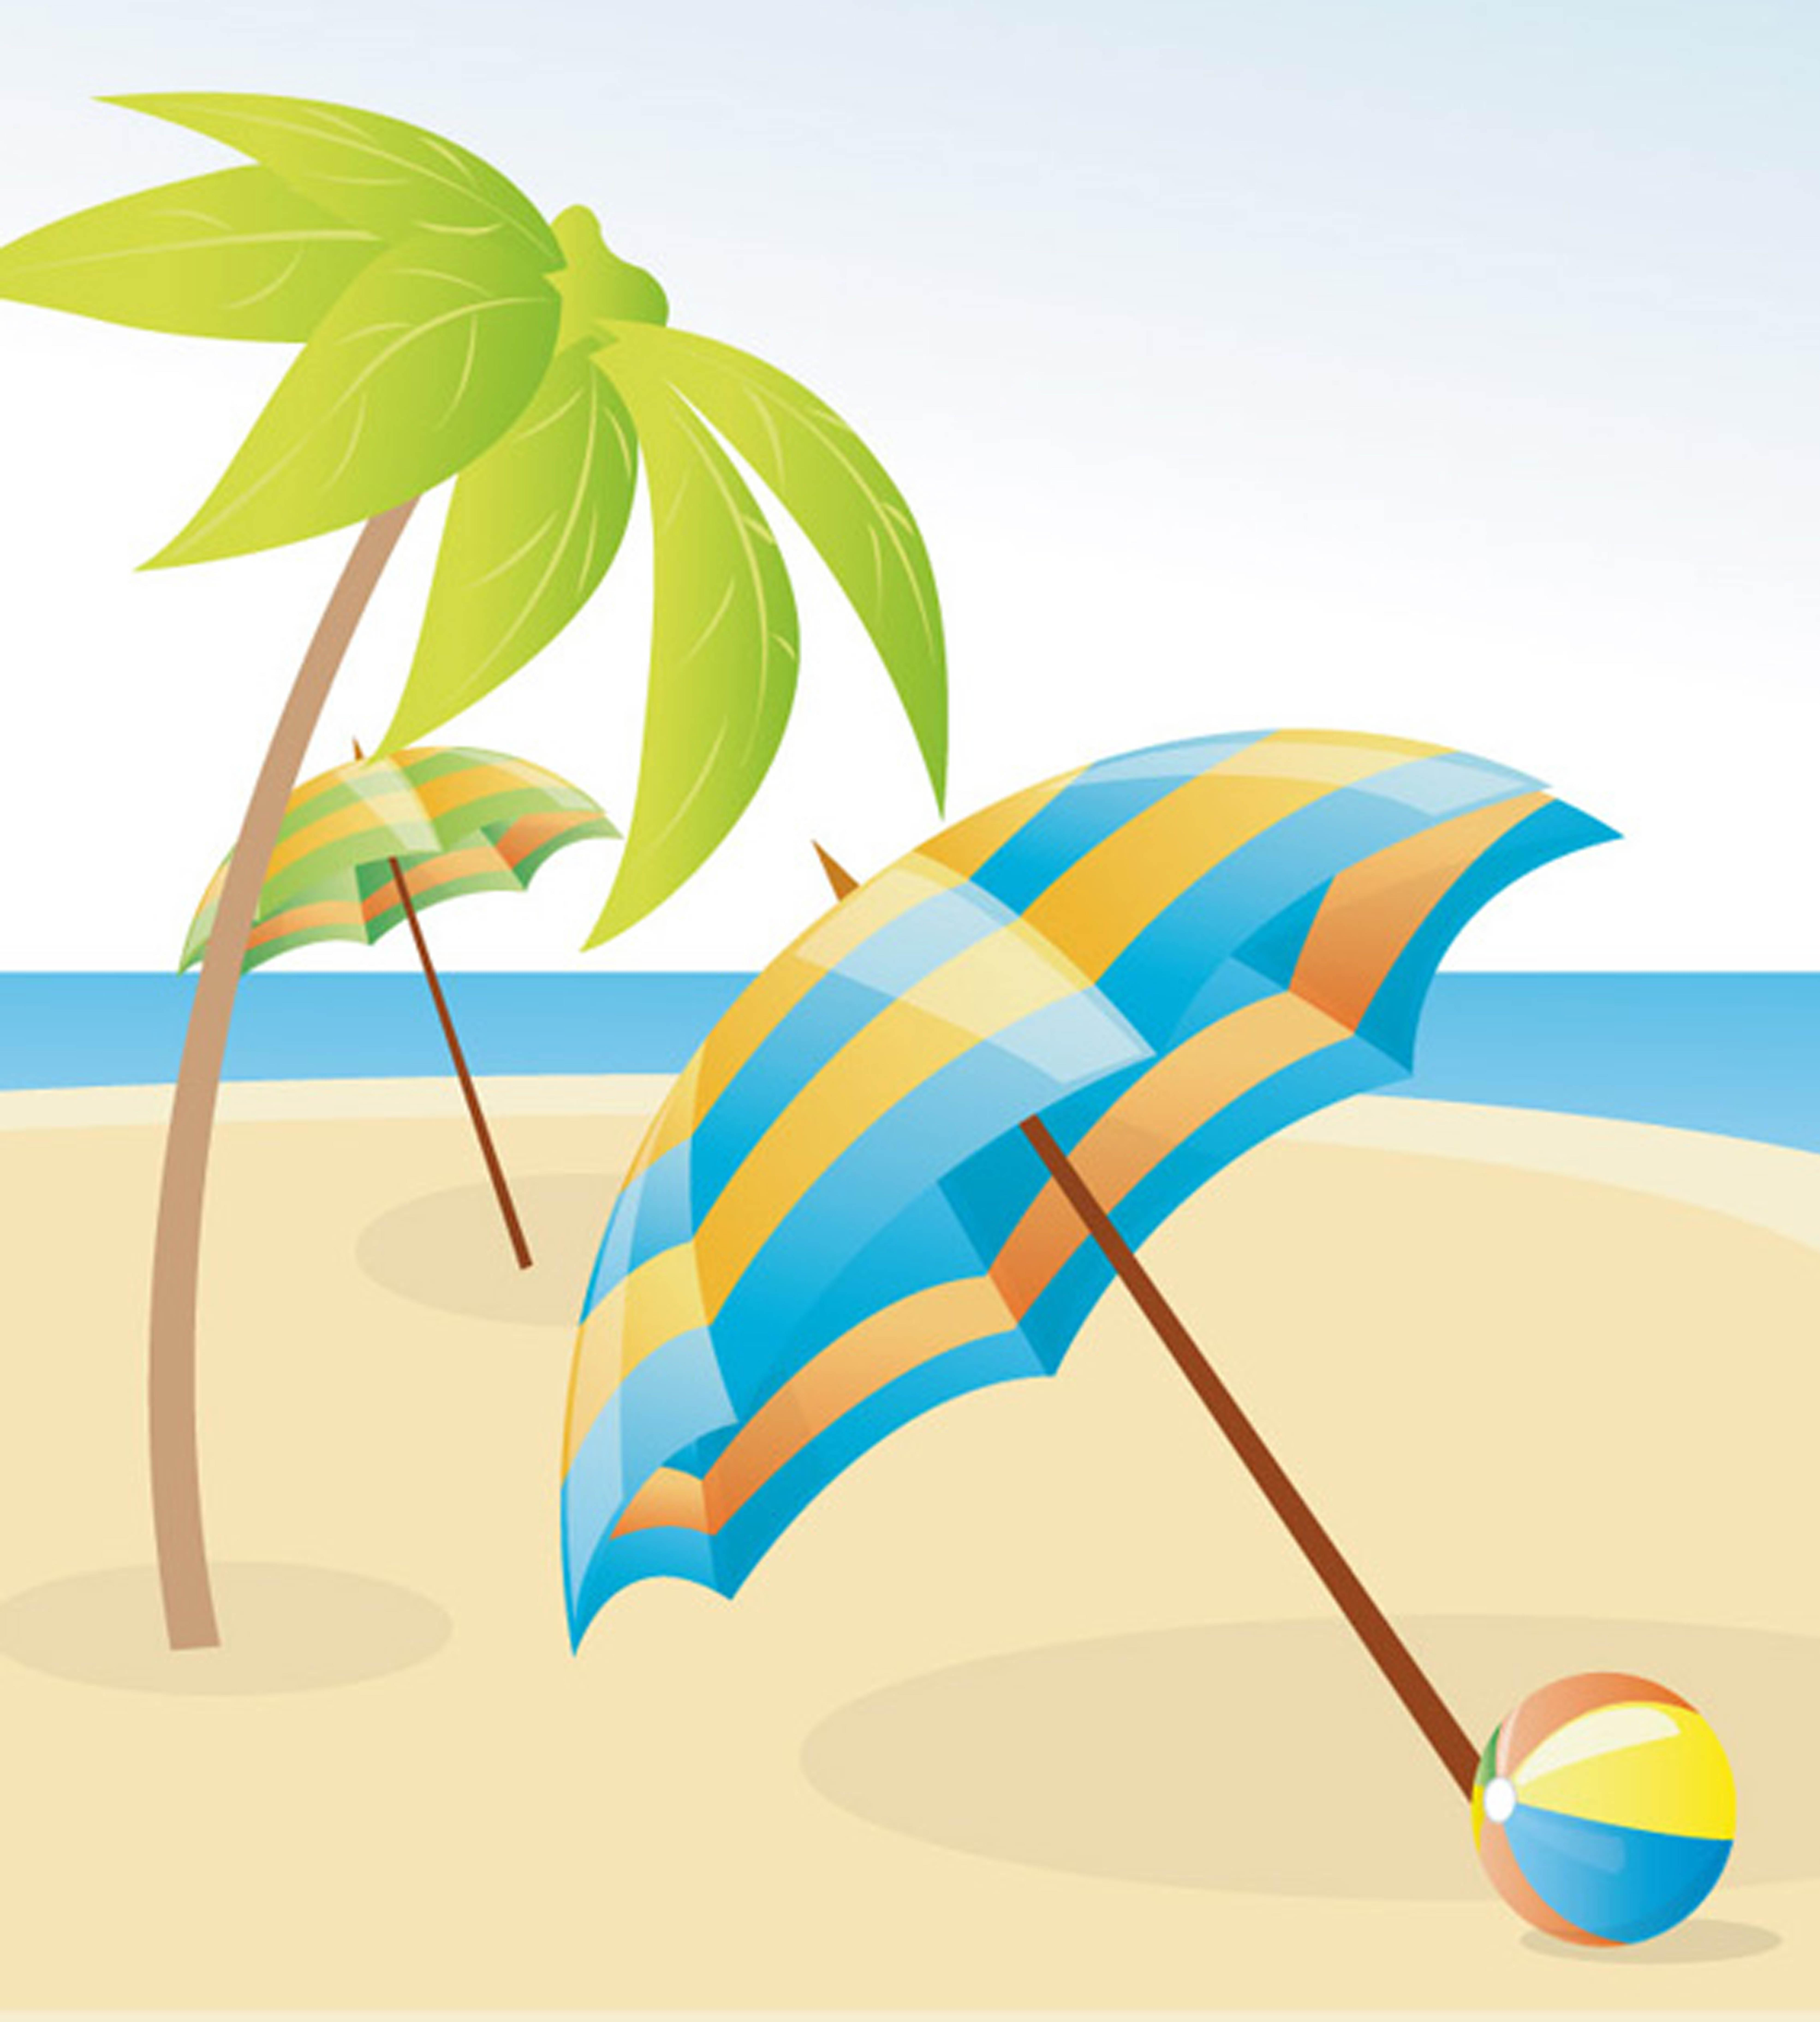 Beachball clipart sun umbrella. Free beach cliparts download